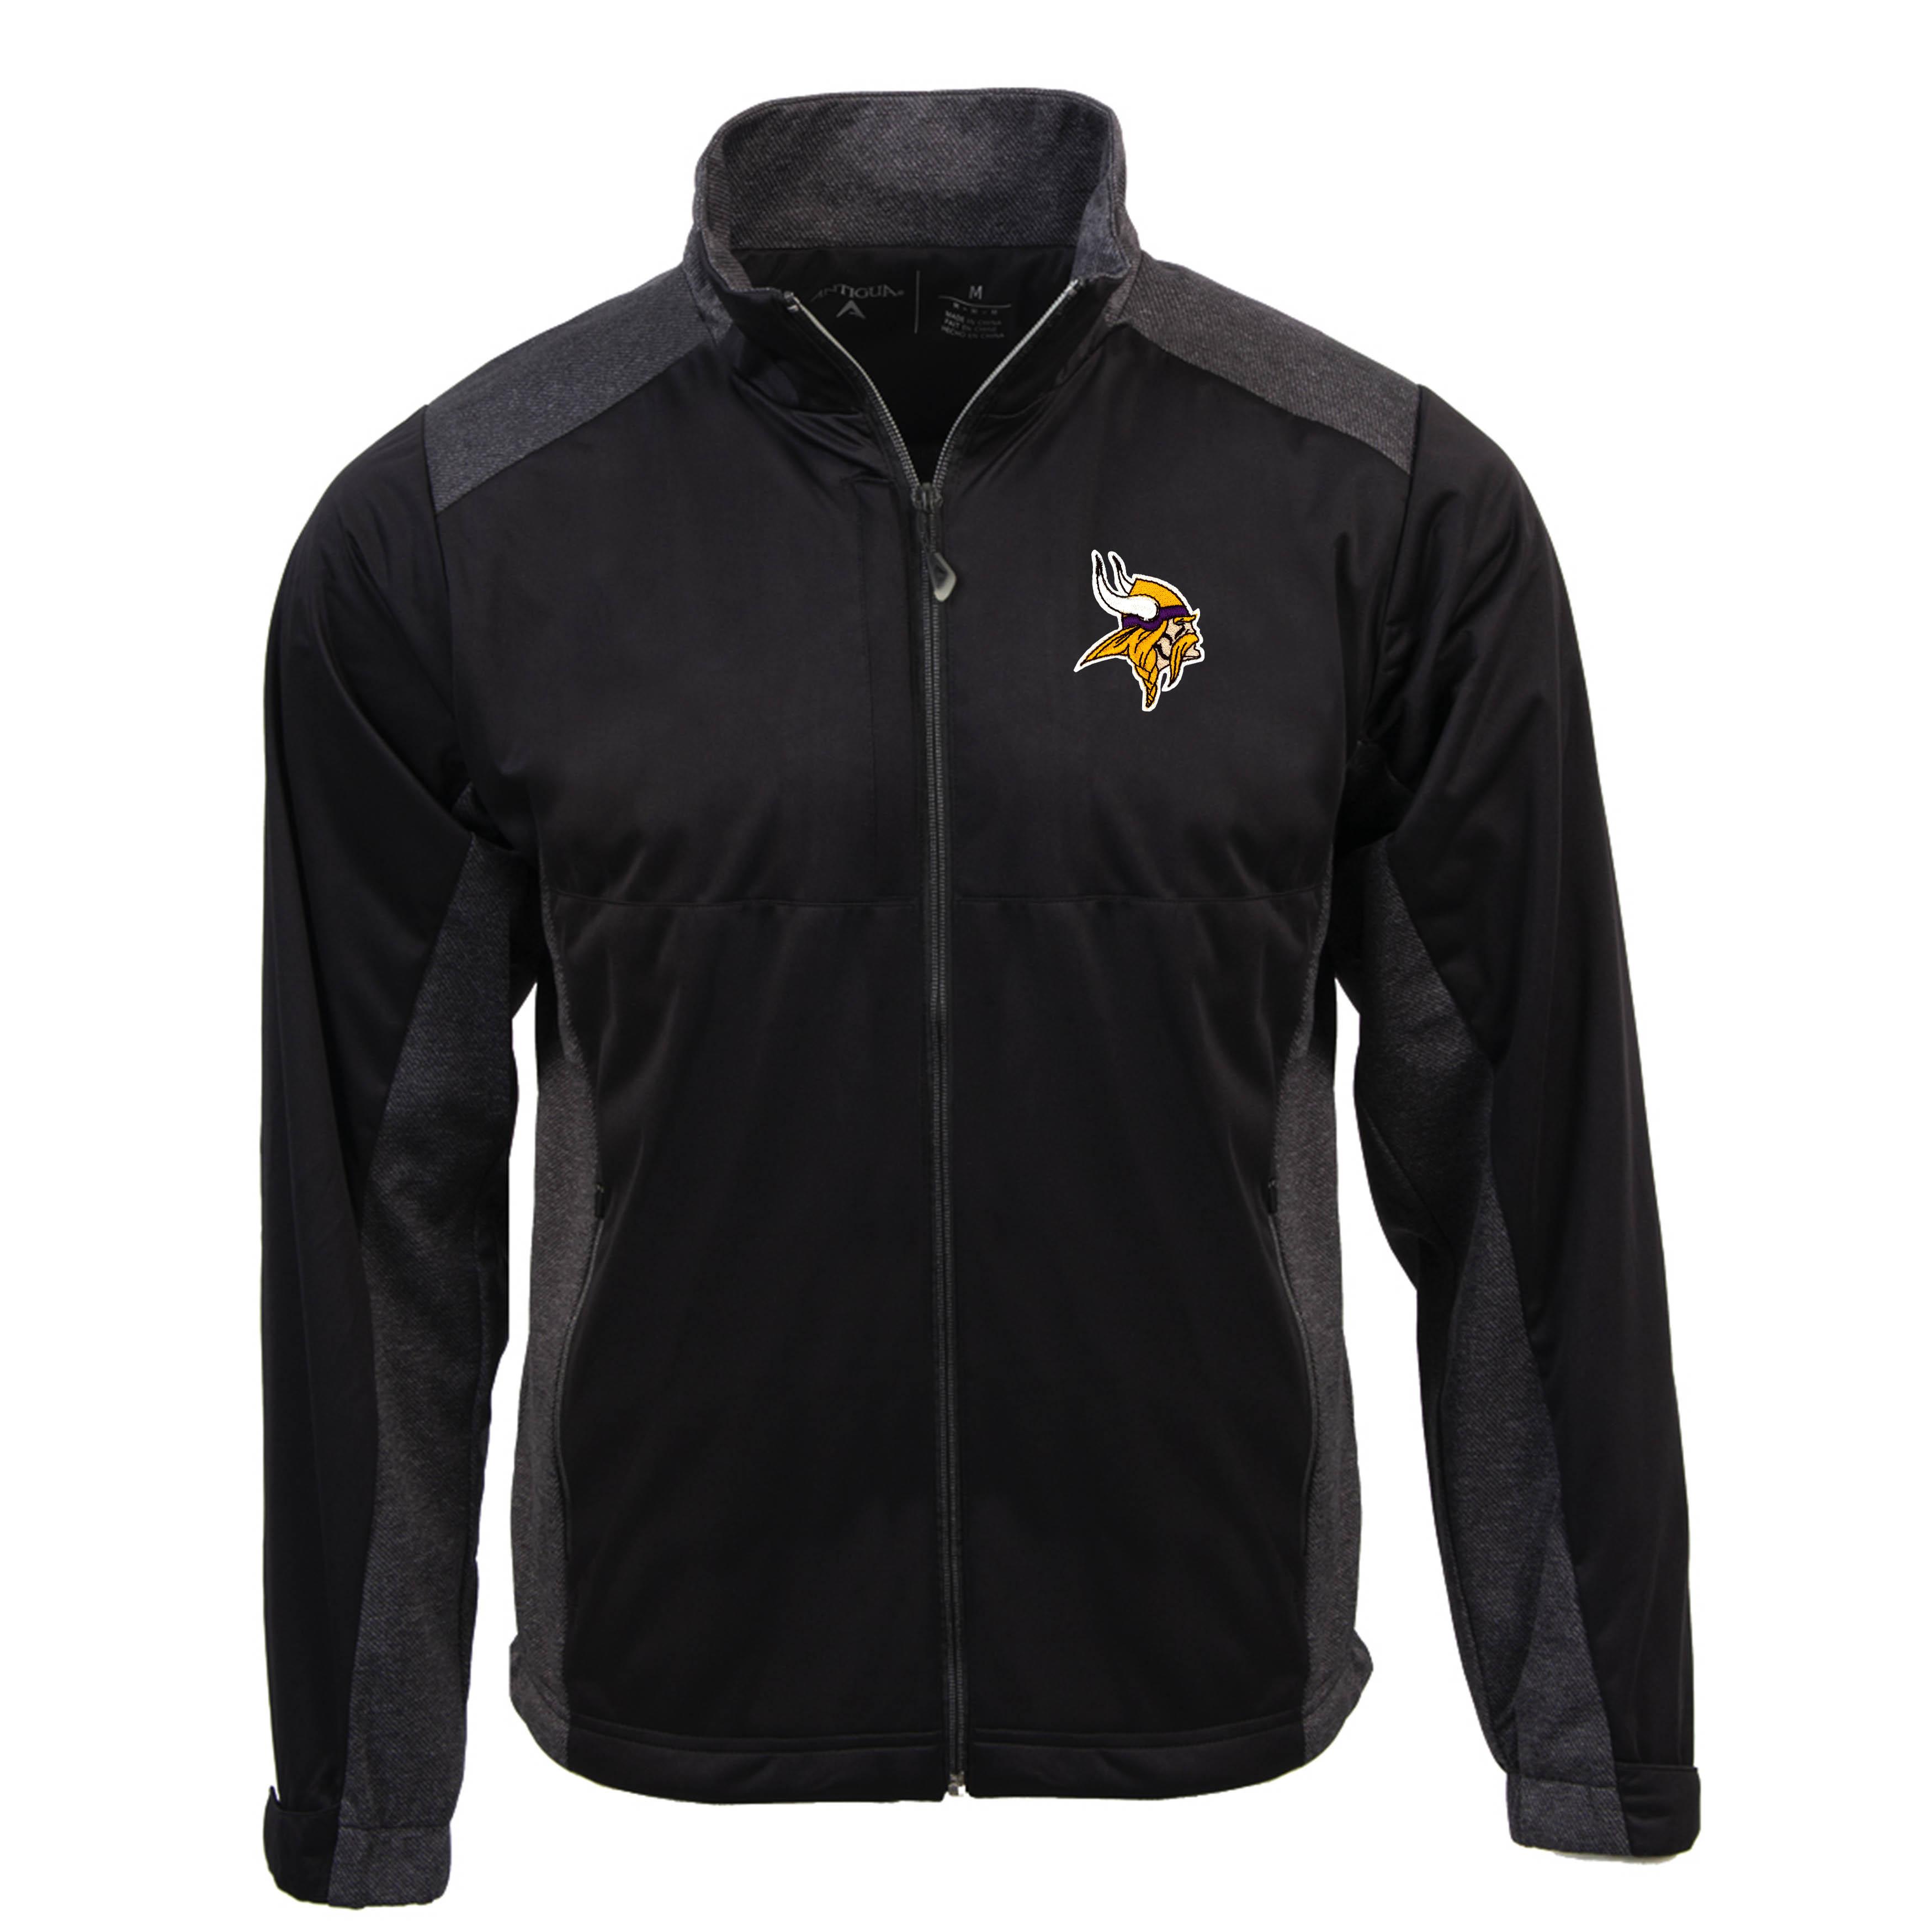 Minnesota Vikings Antigua Revolve Full-Zip Jacket - Black